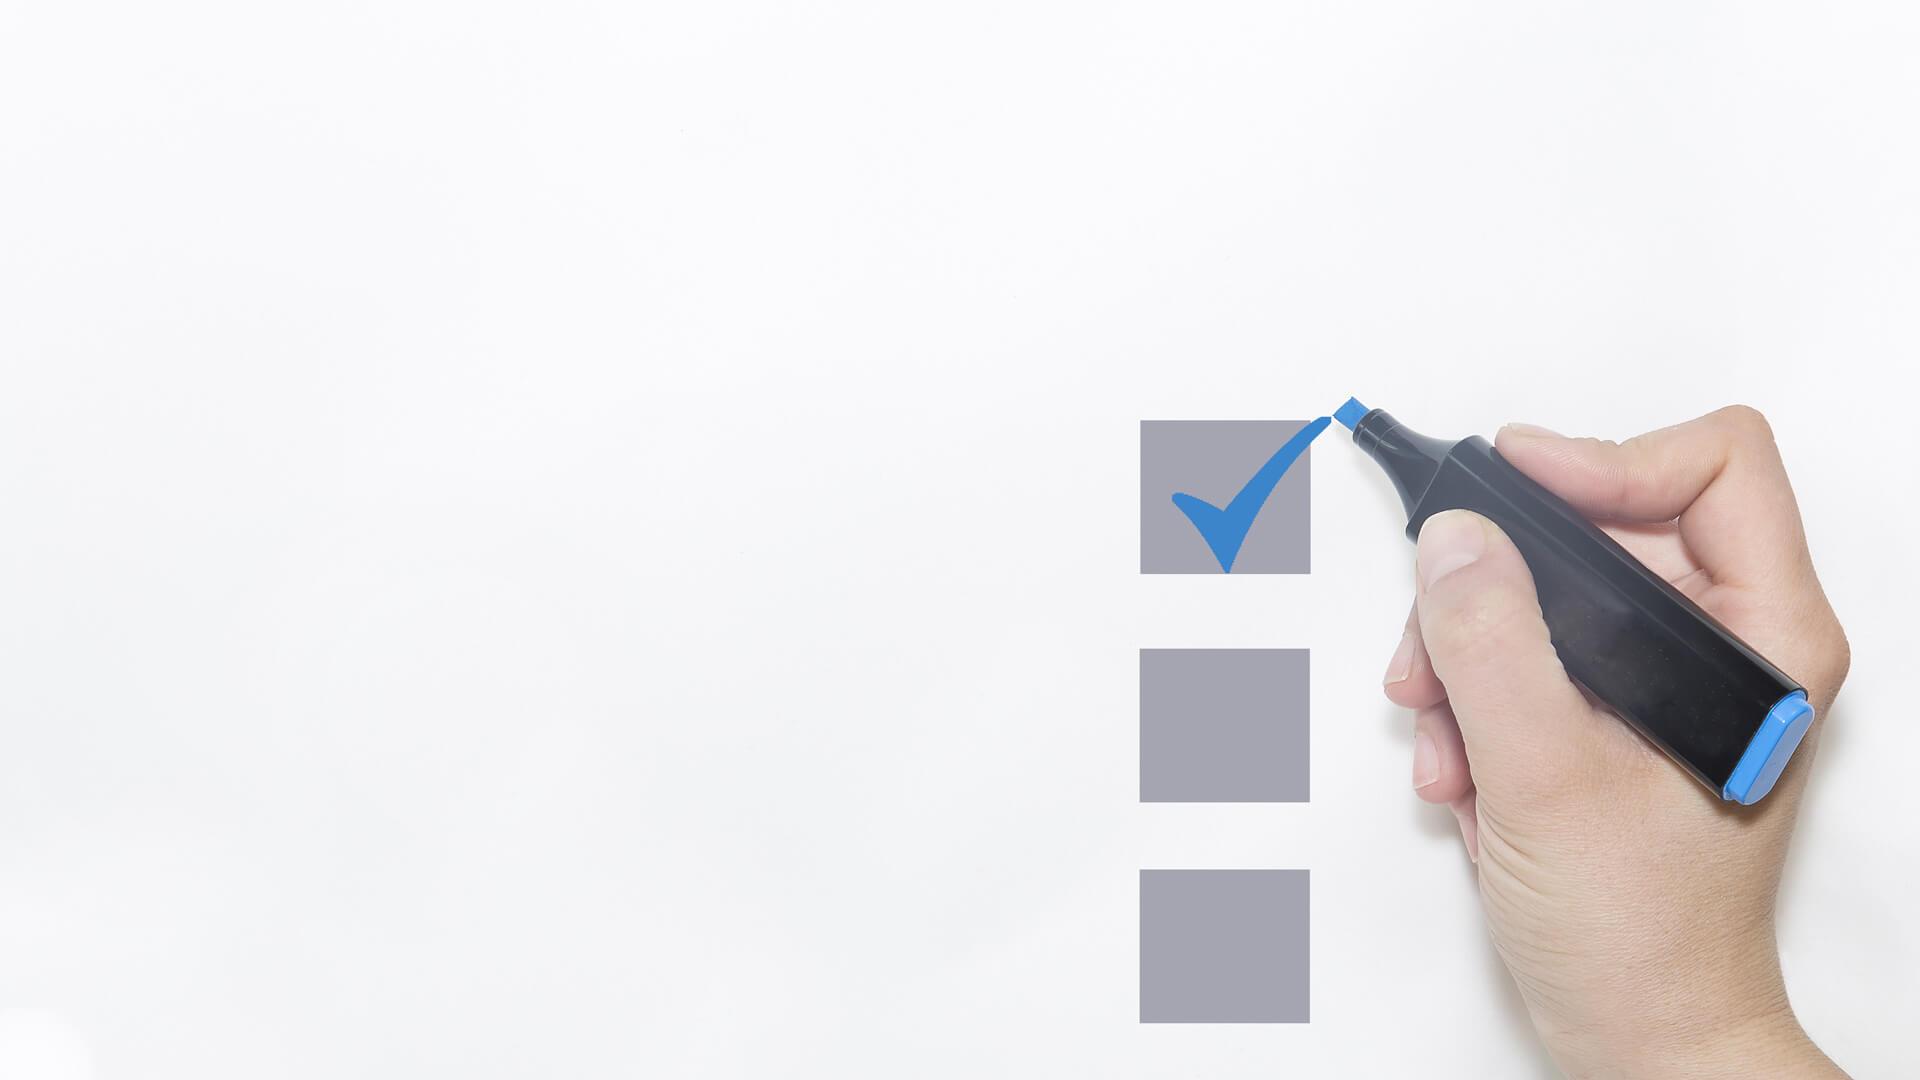 ss-choose-options-check